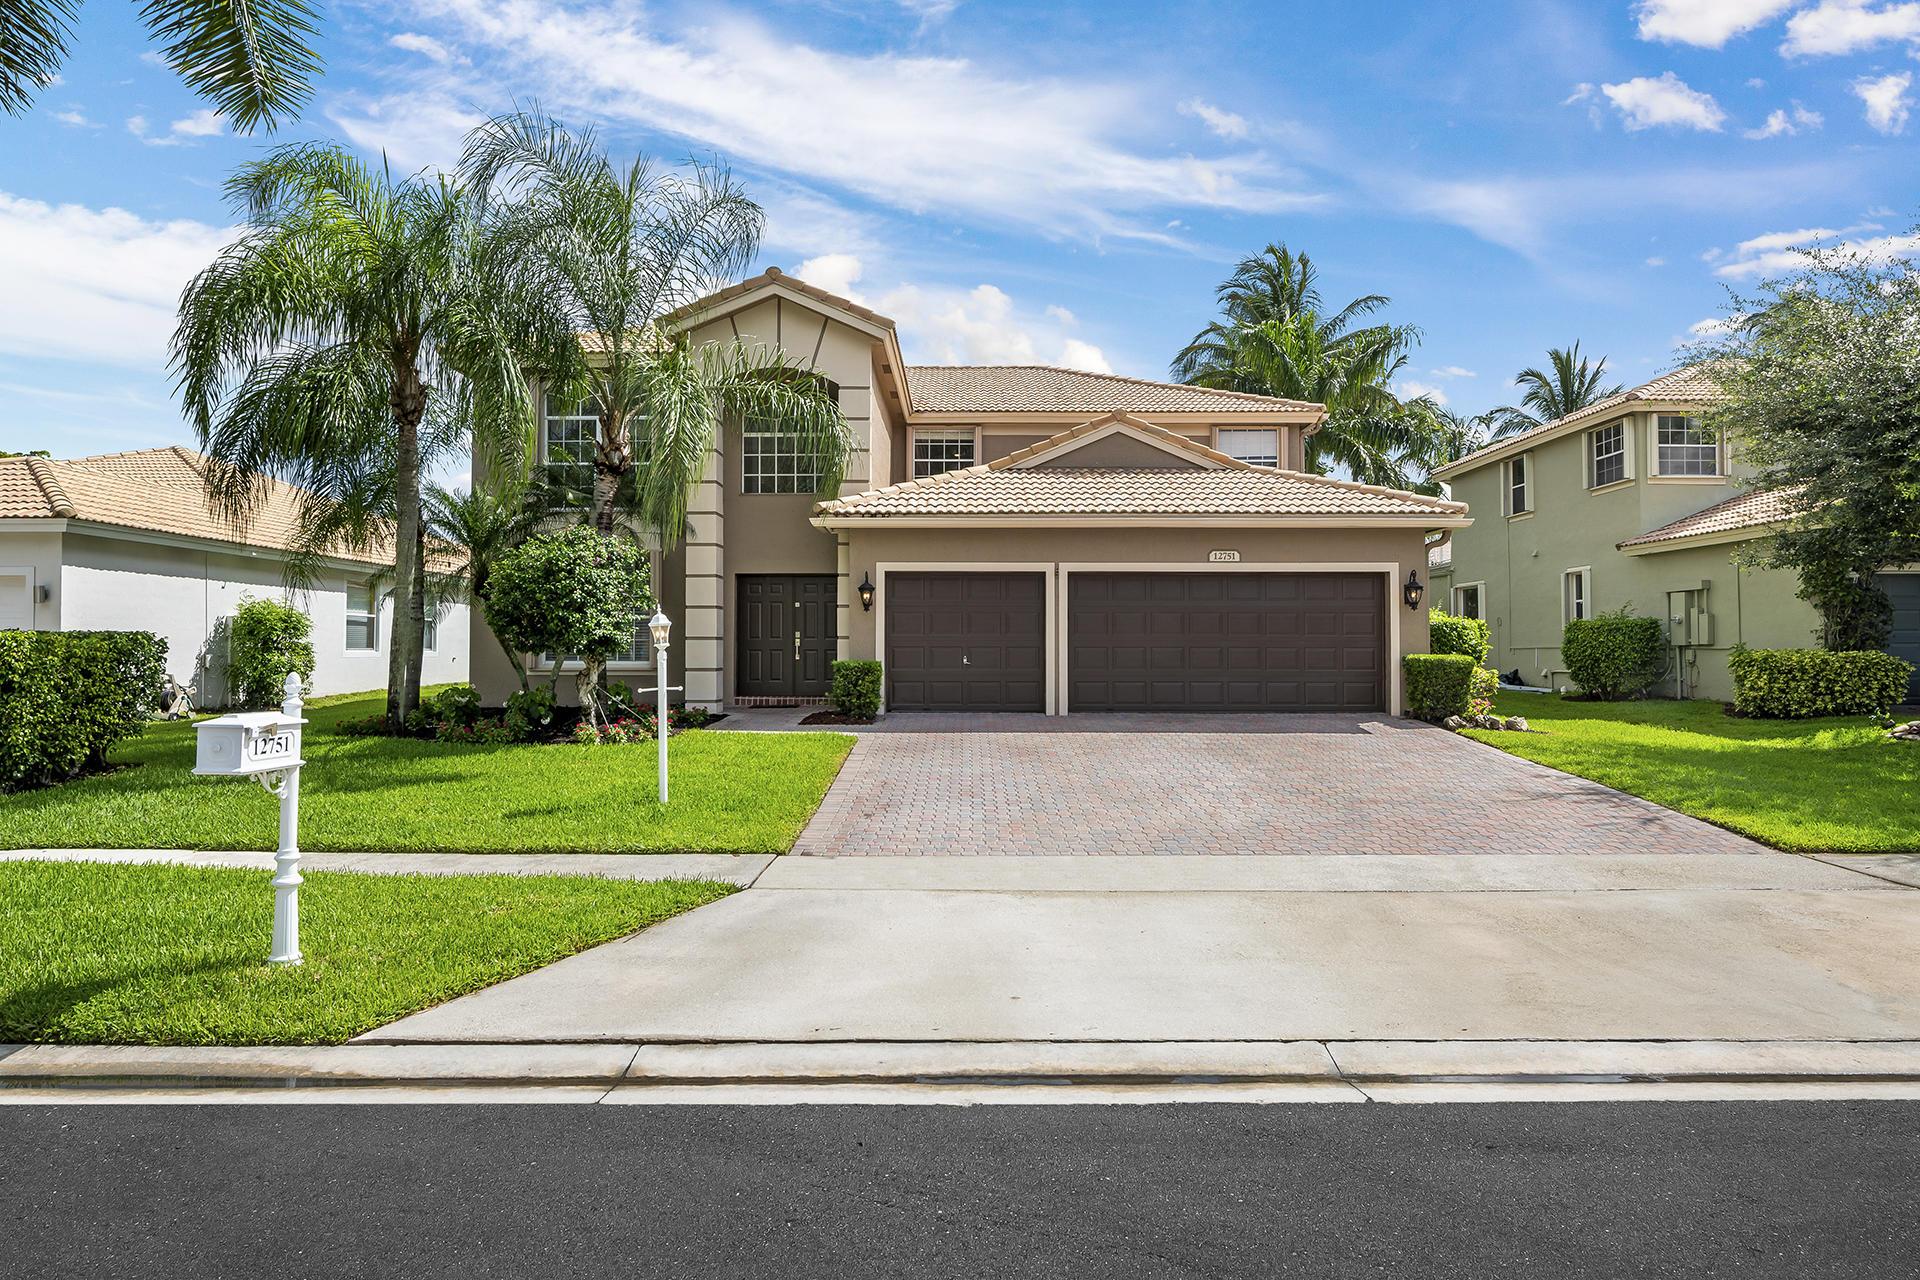 12751 Yardley Drive  Boca Raton, FL 33428